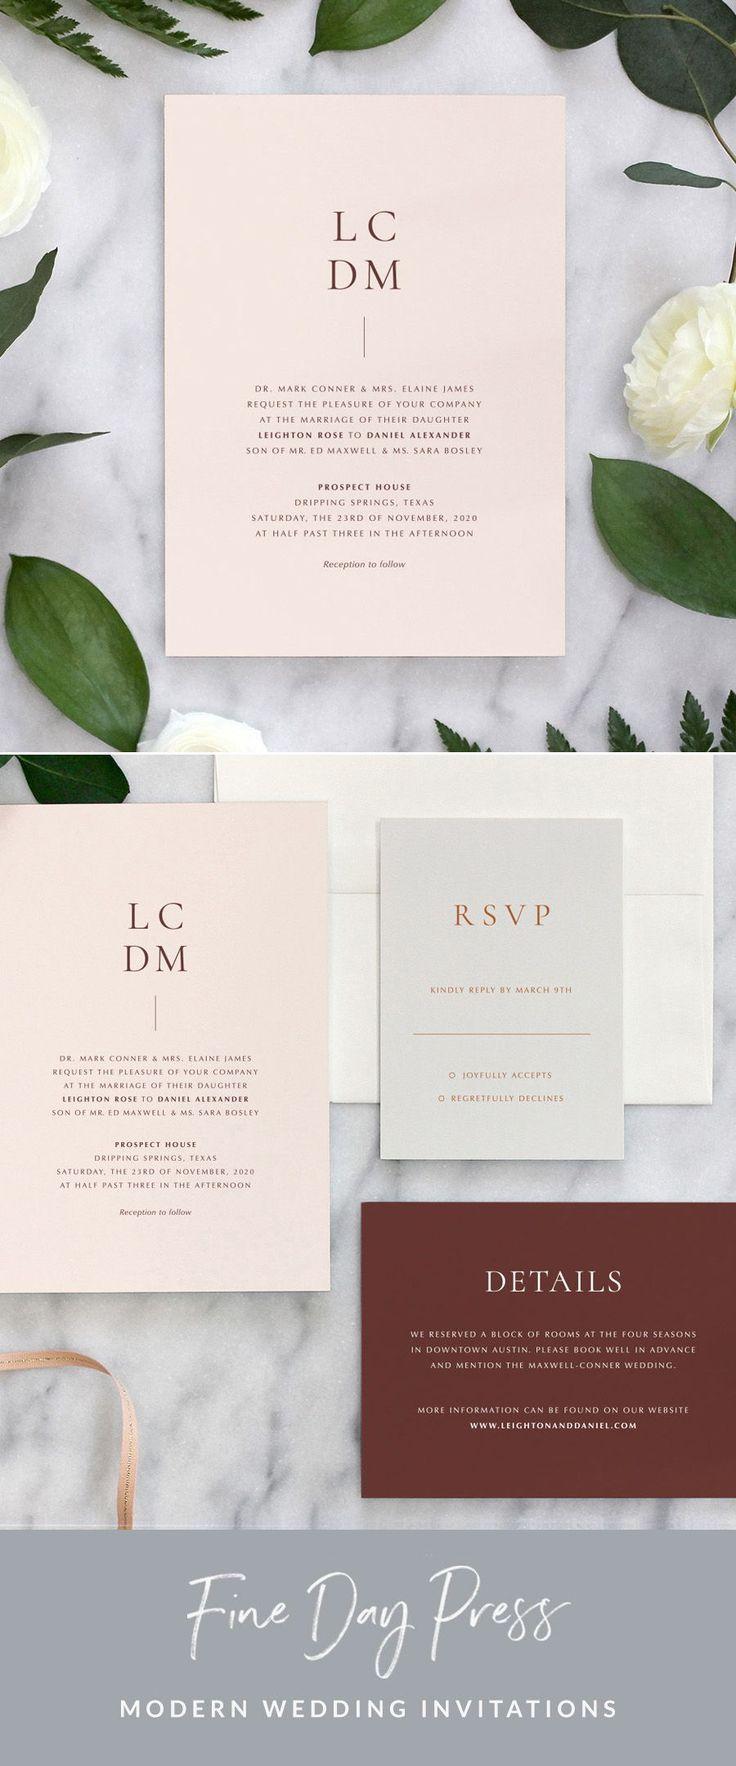 Artisan Wedding Invitation Fine Day Press In 2020 Modern Wedding Invitations Minimalist Wedding Invitations Wedding Invitations